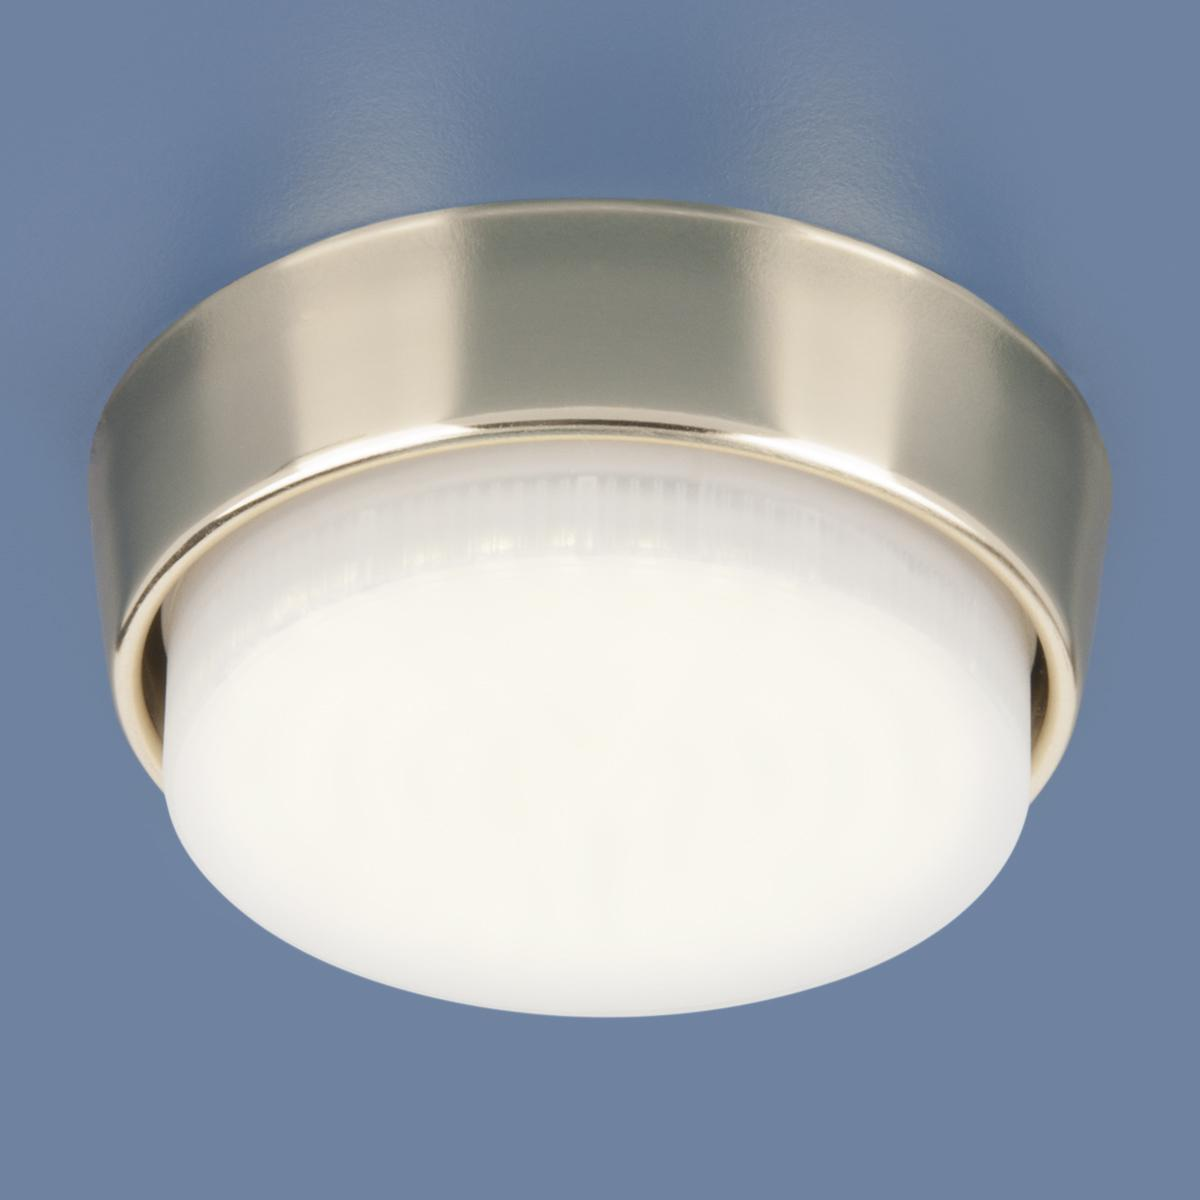 Накладной светильник Elektrostandard 1037 GX53 GD золото 4690389071522 elektrostandard накладной точечный светильник elektrostandard 1037 gx53 gd золото 4690389071522